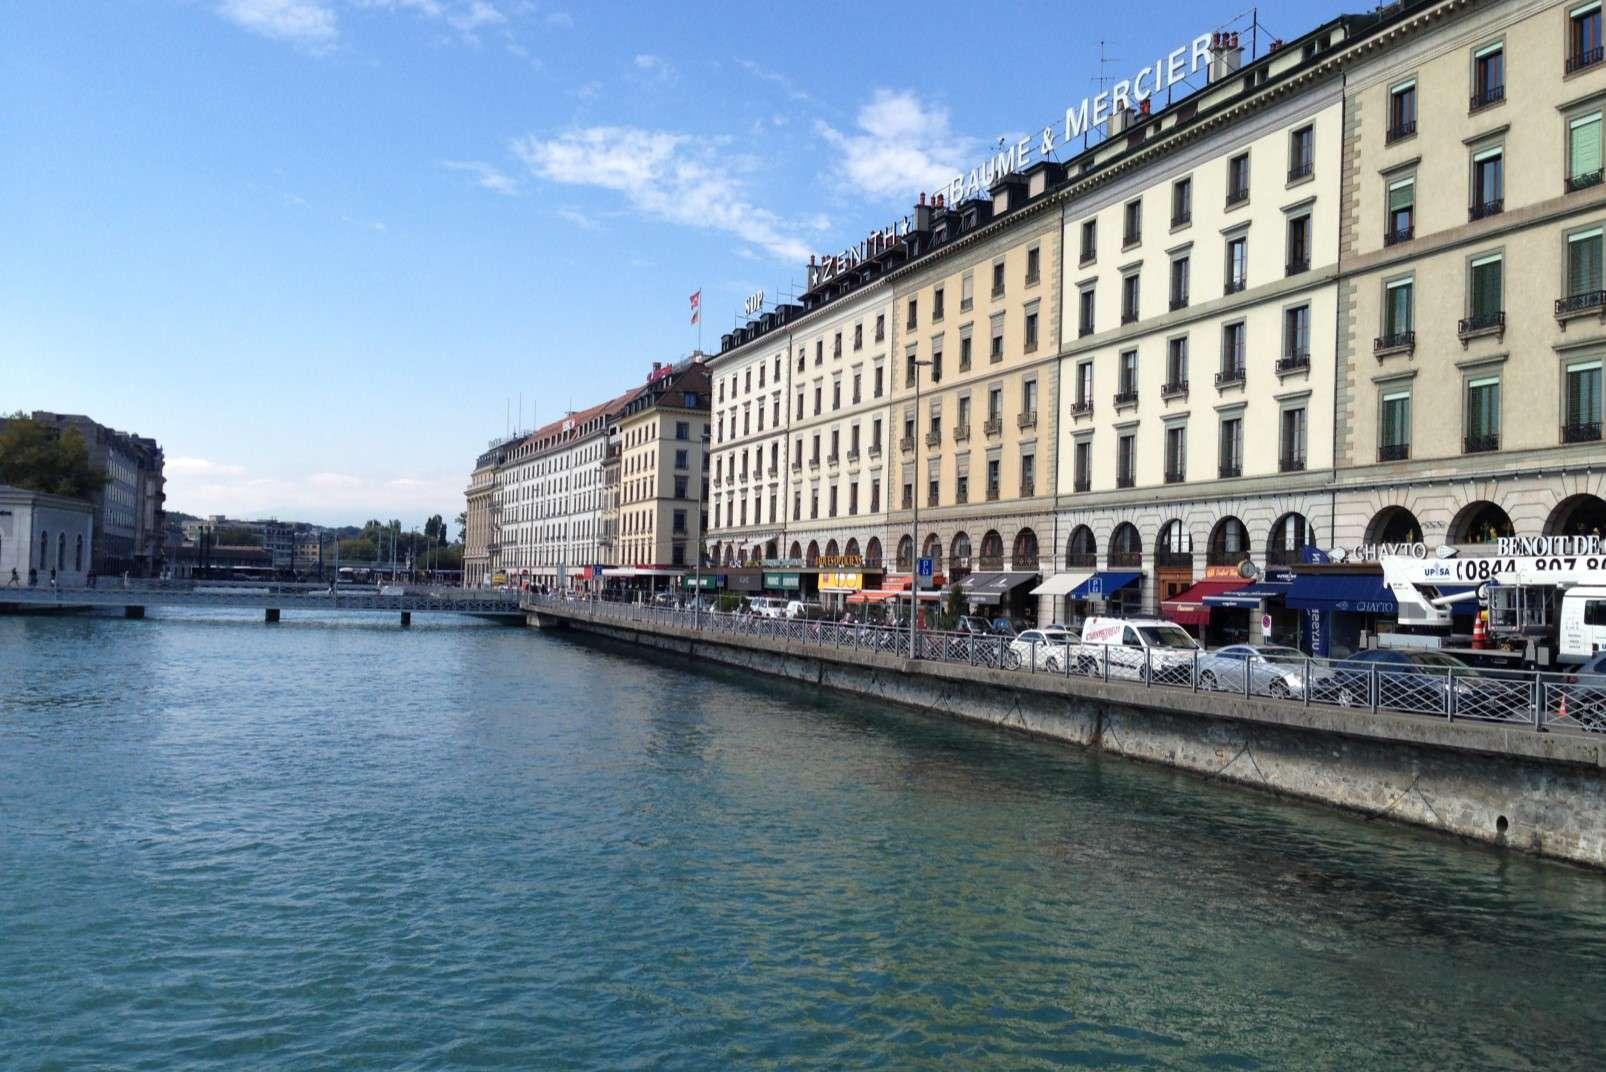 Geneva waterside